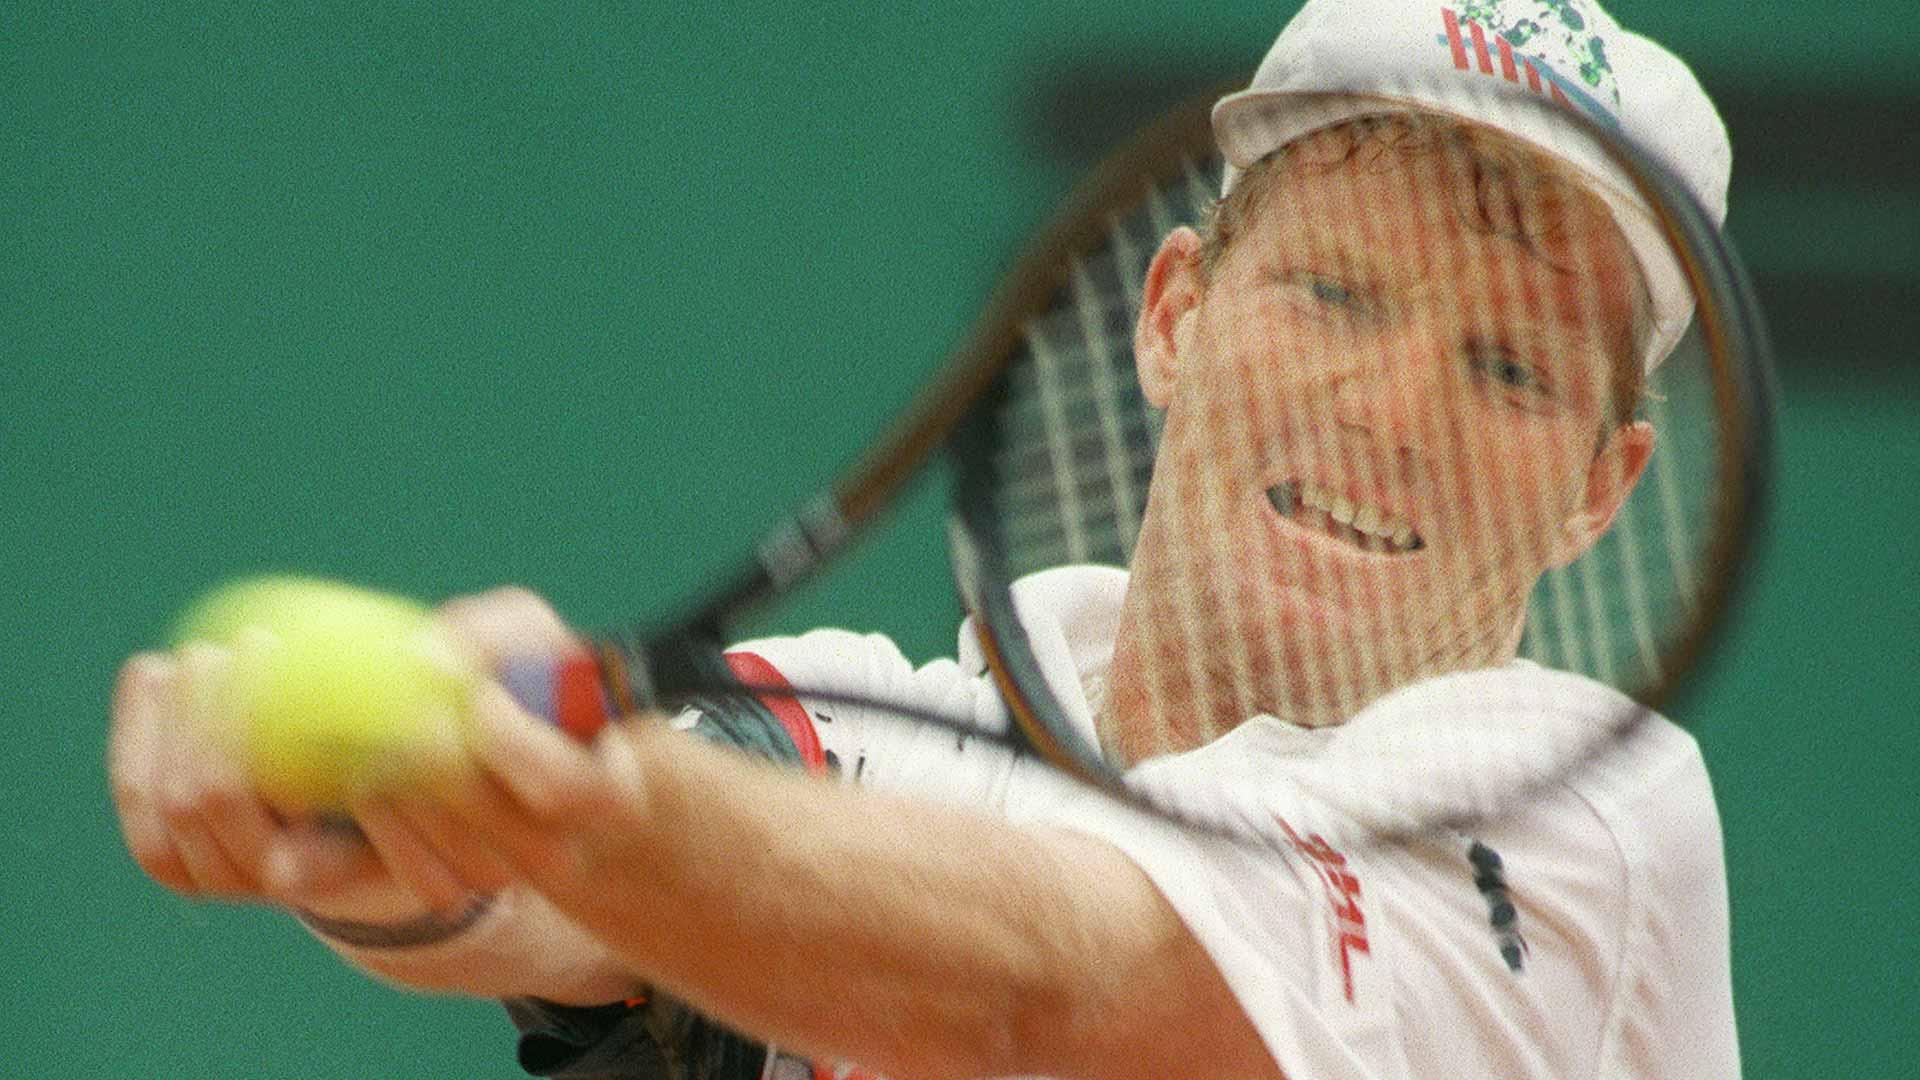 Heritage Jim Courier ATP World Tour